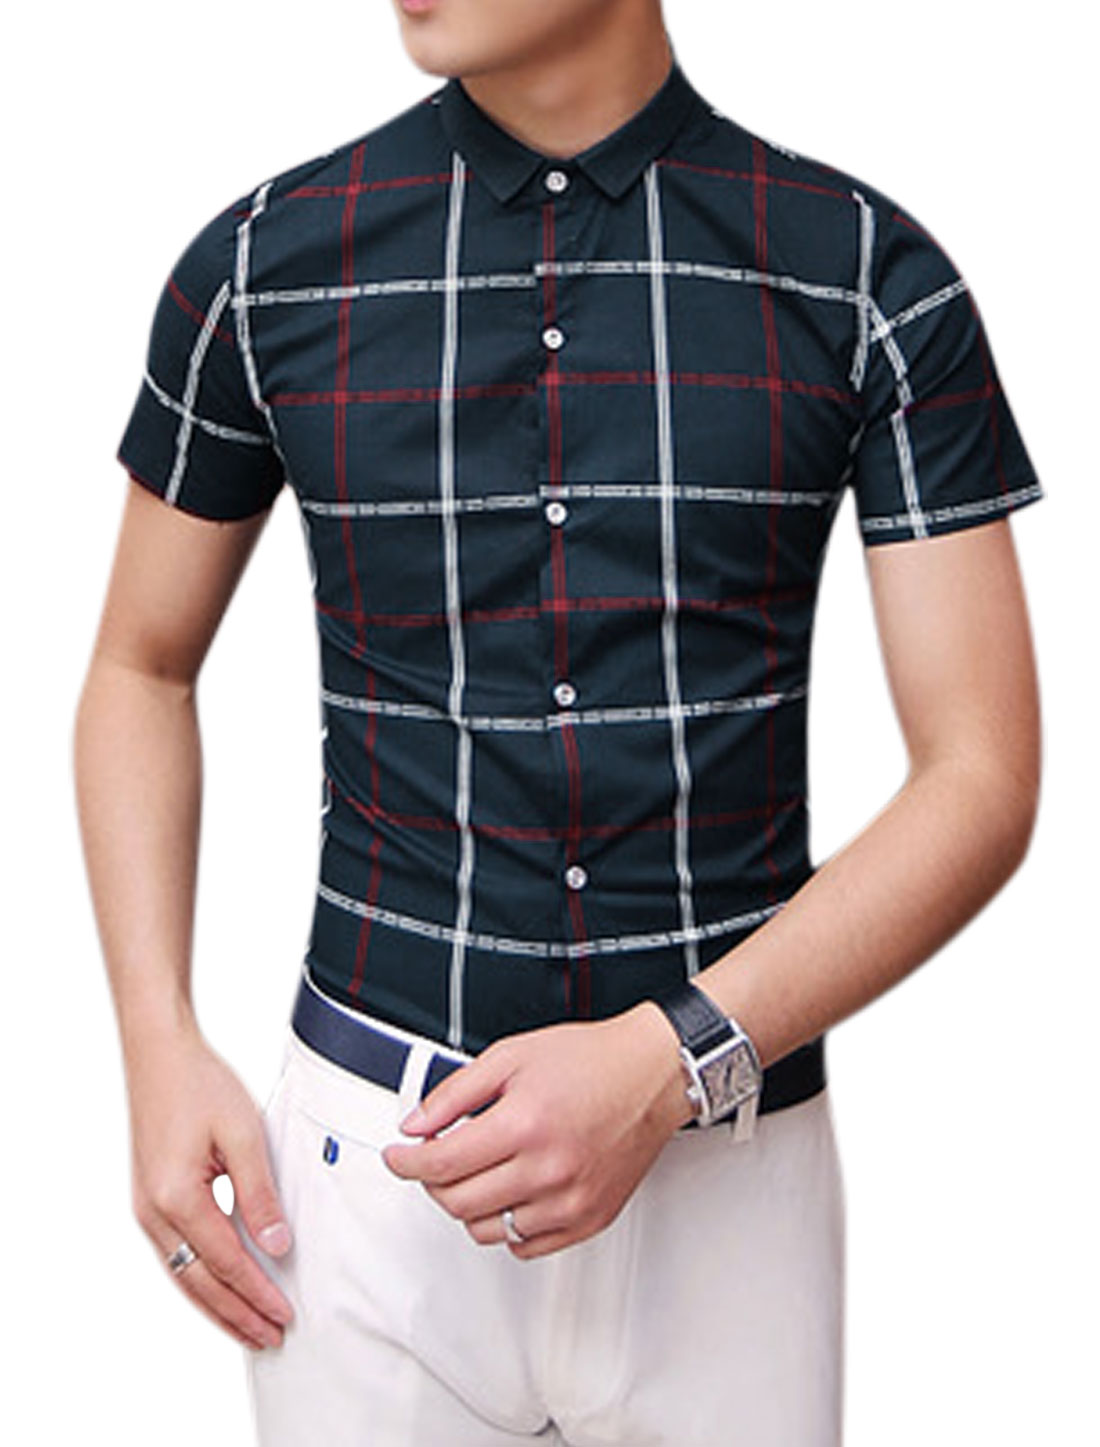 Man Short Sleeves Checks Prints Shirts Navy Blue S